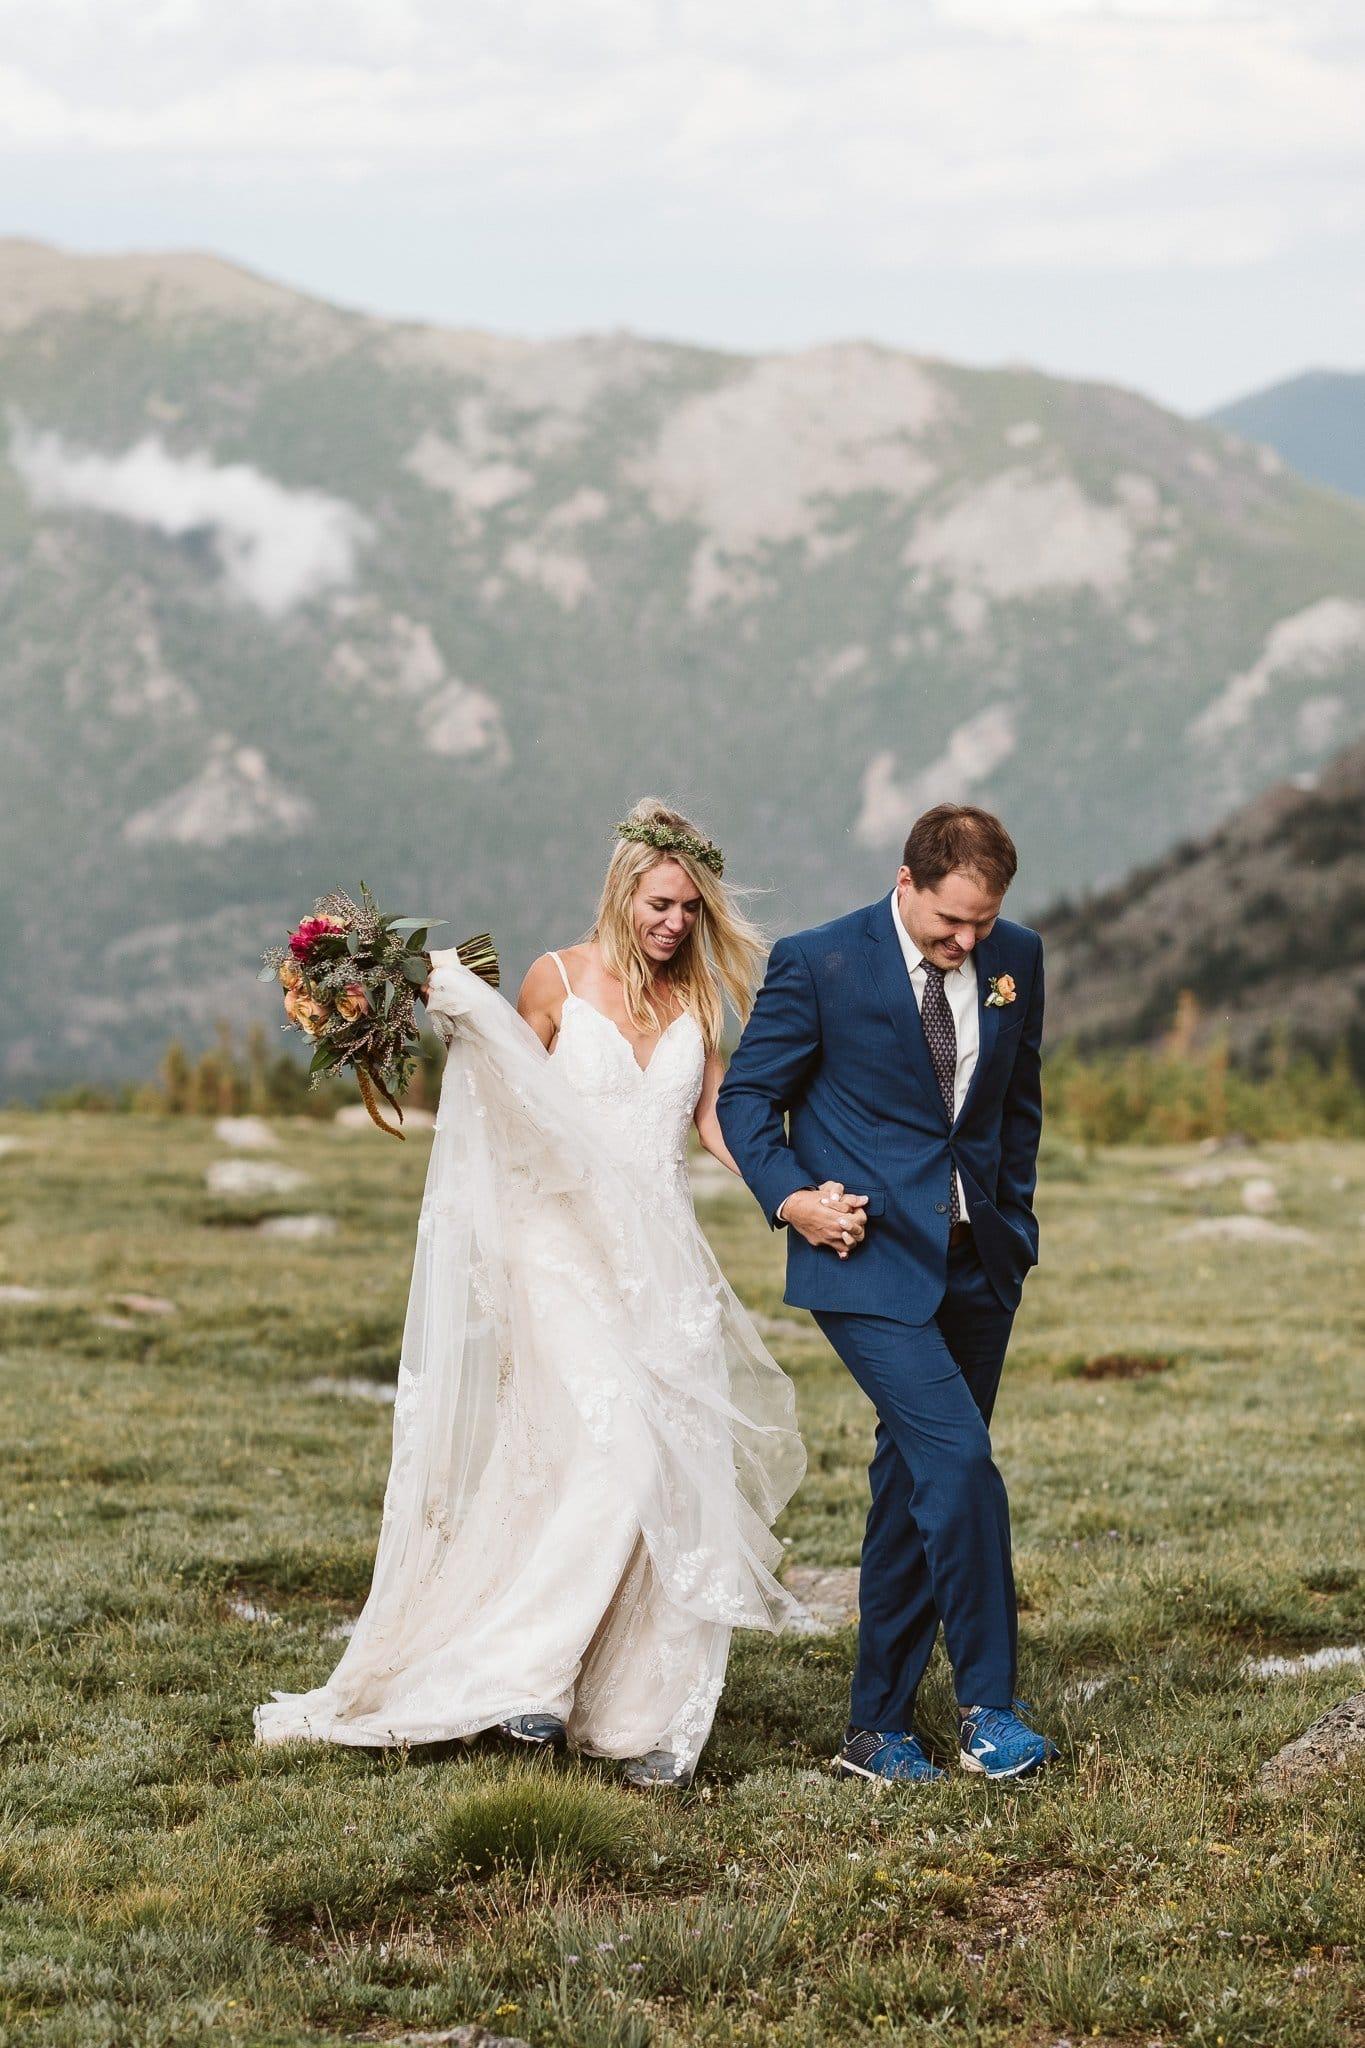 Rocky Mountain National Park elopement photographer, Colorado hiking adventure elopement